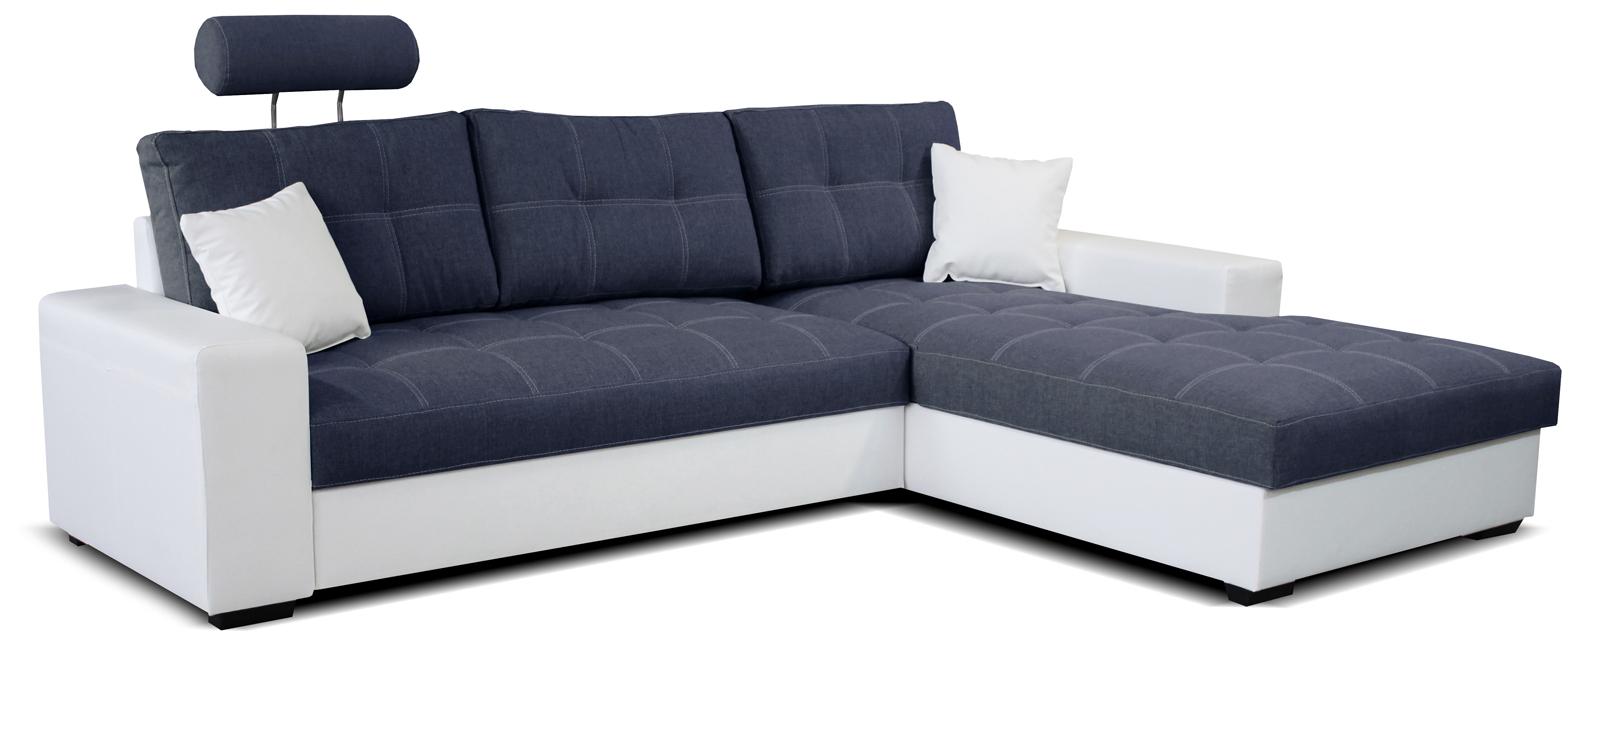 Rohová sedací souprava - Po-Sed - Corato 2F+L (modrá + bílá) (P)